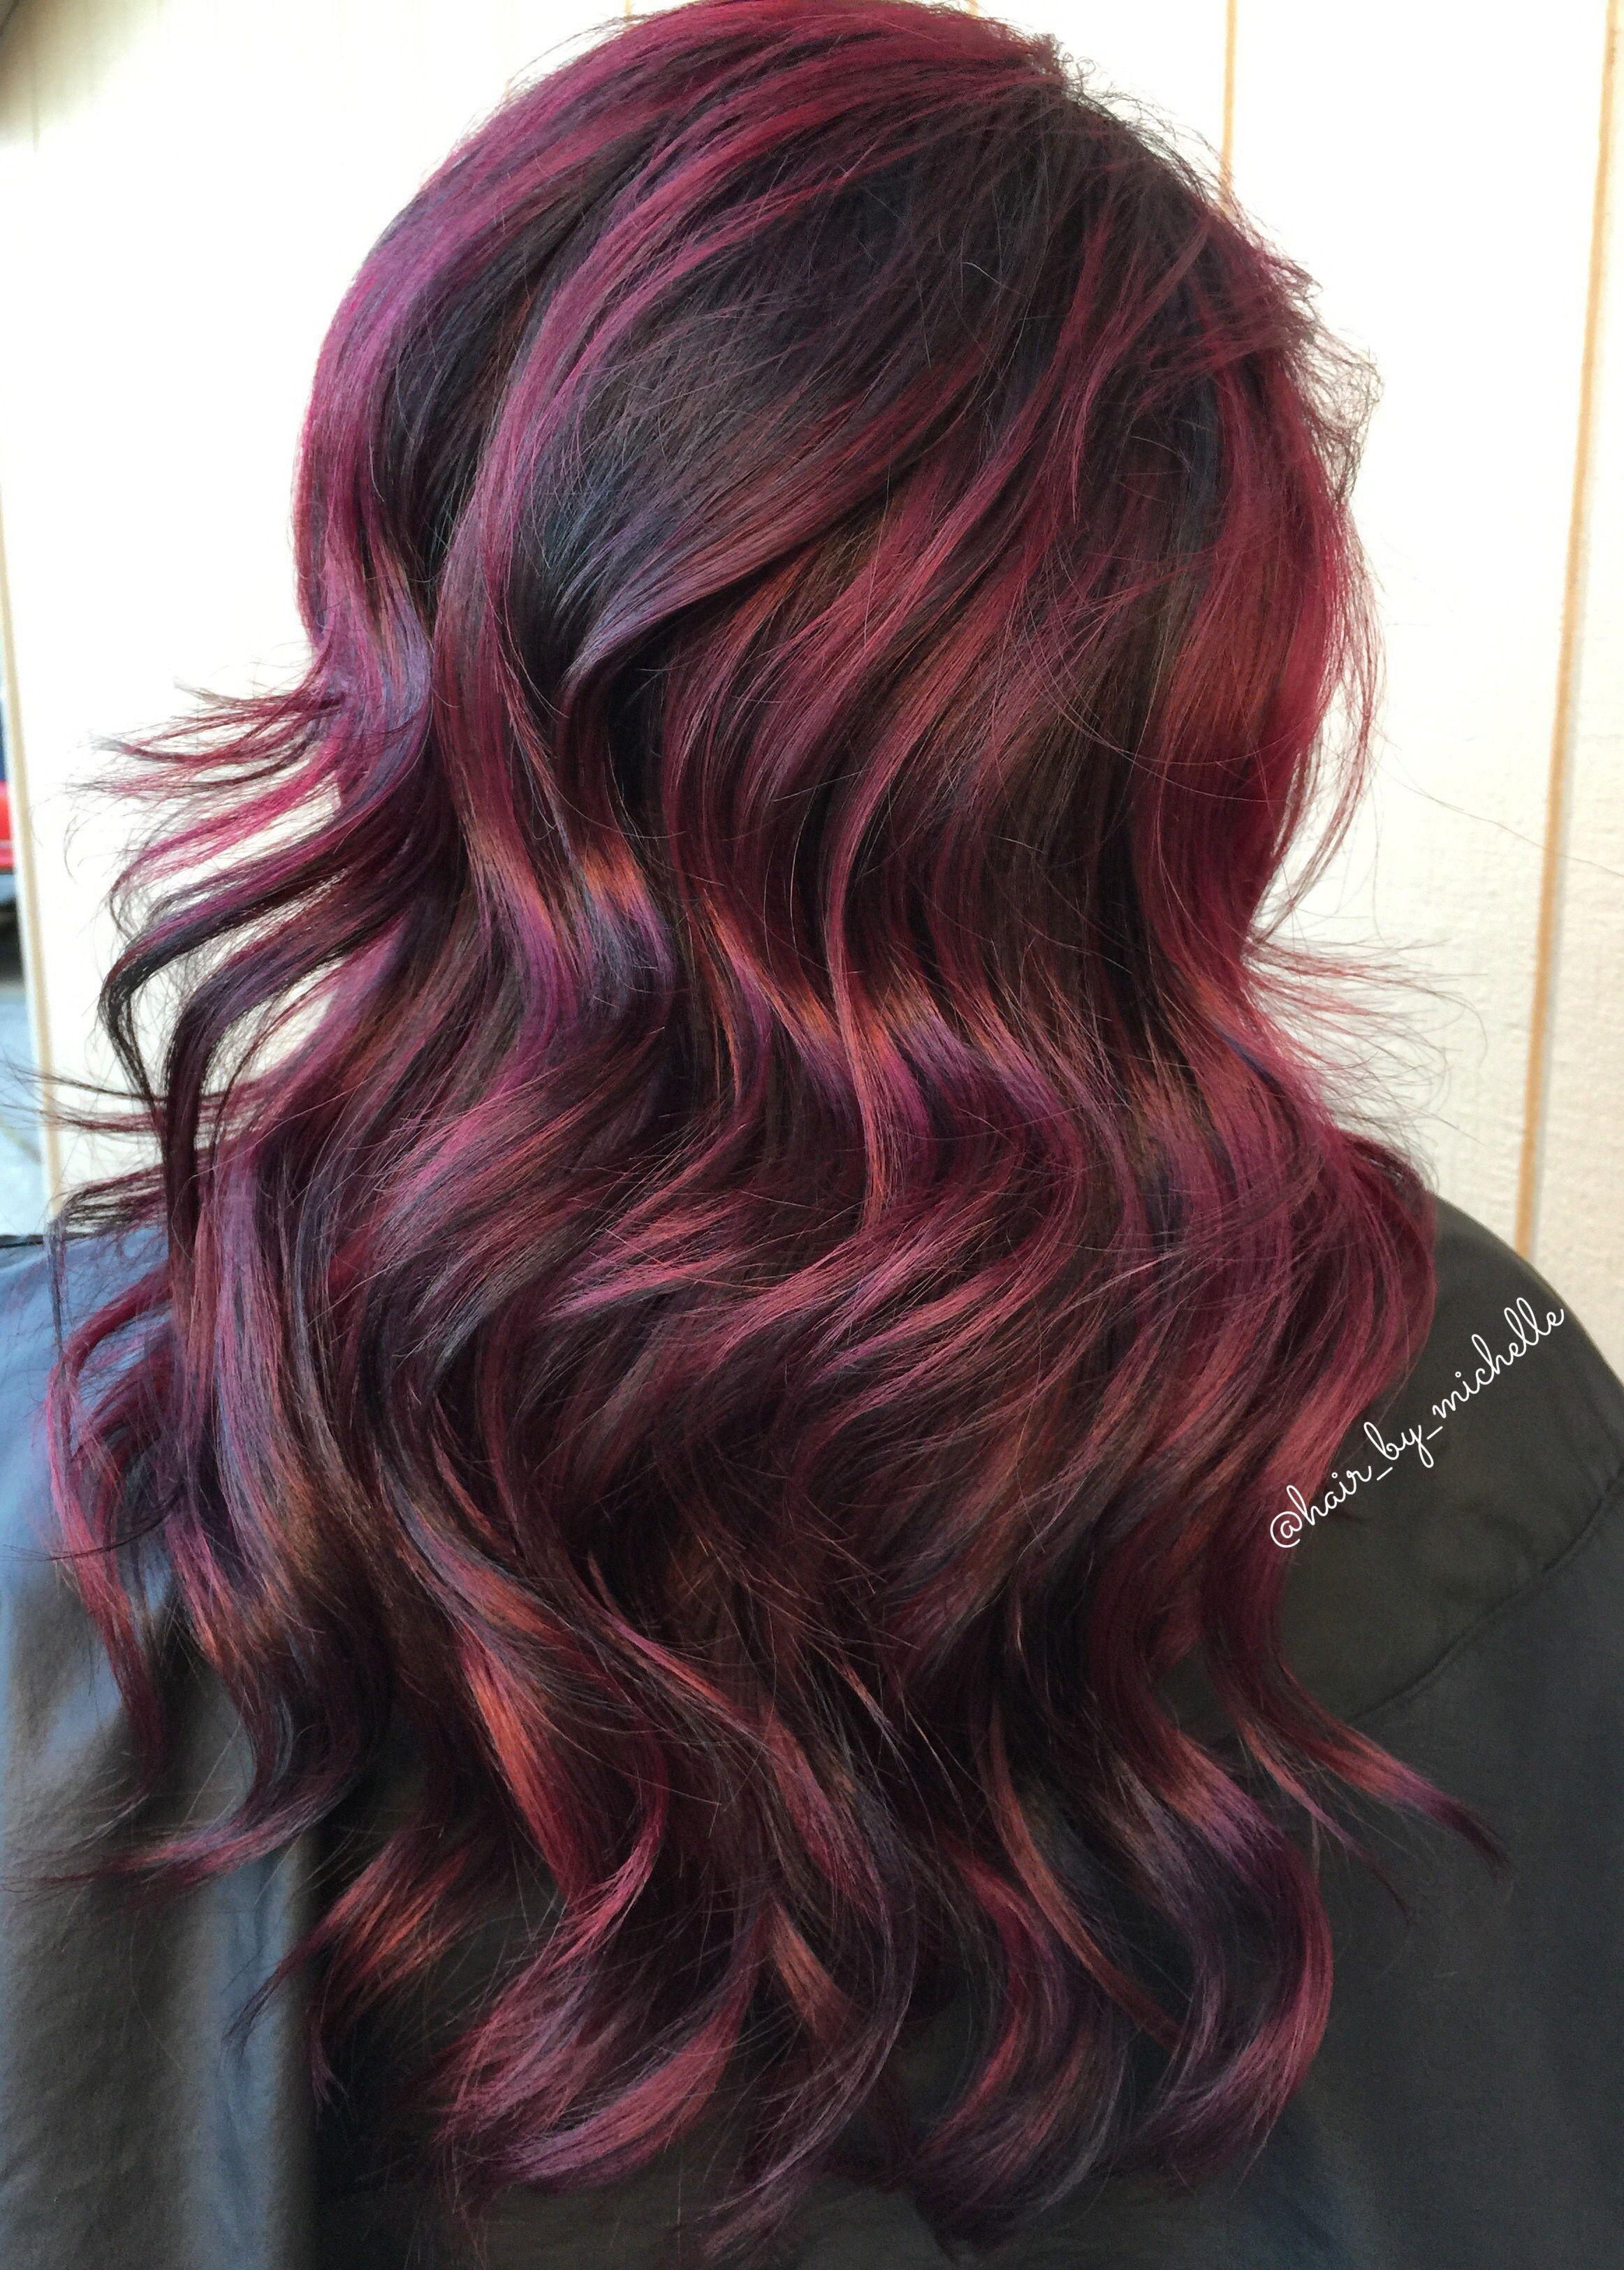 Painted Hair Dark Hair Red Hair Redbalayage Red Roots Hair Red Hair Dark Roots Shadow Roots Hair